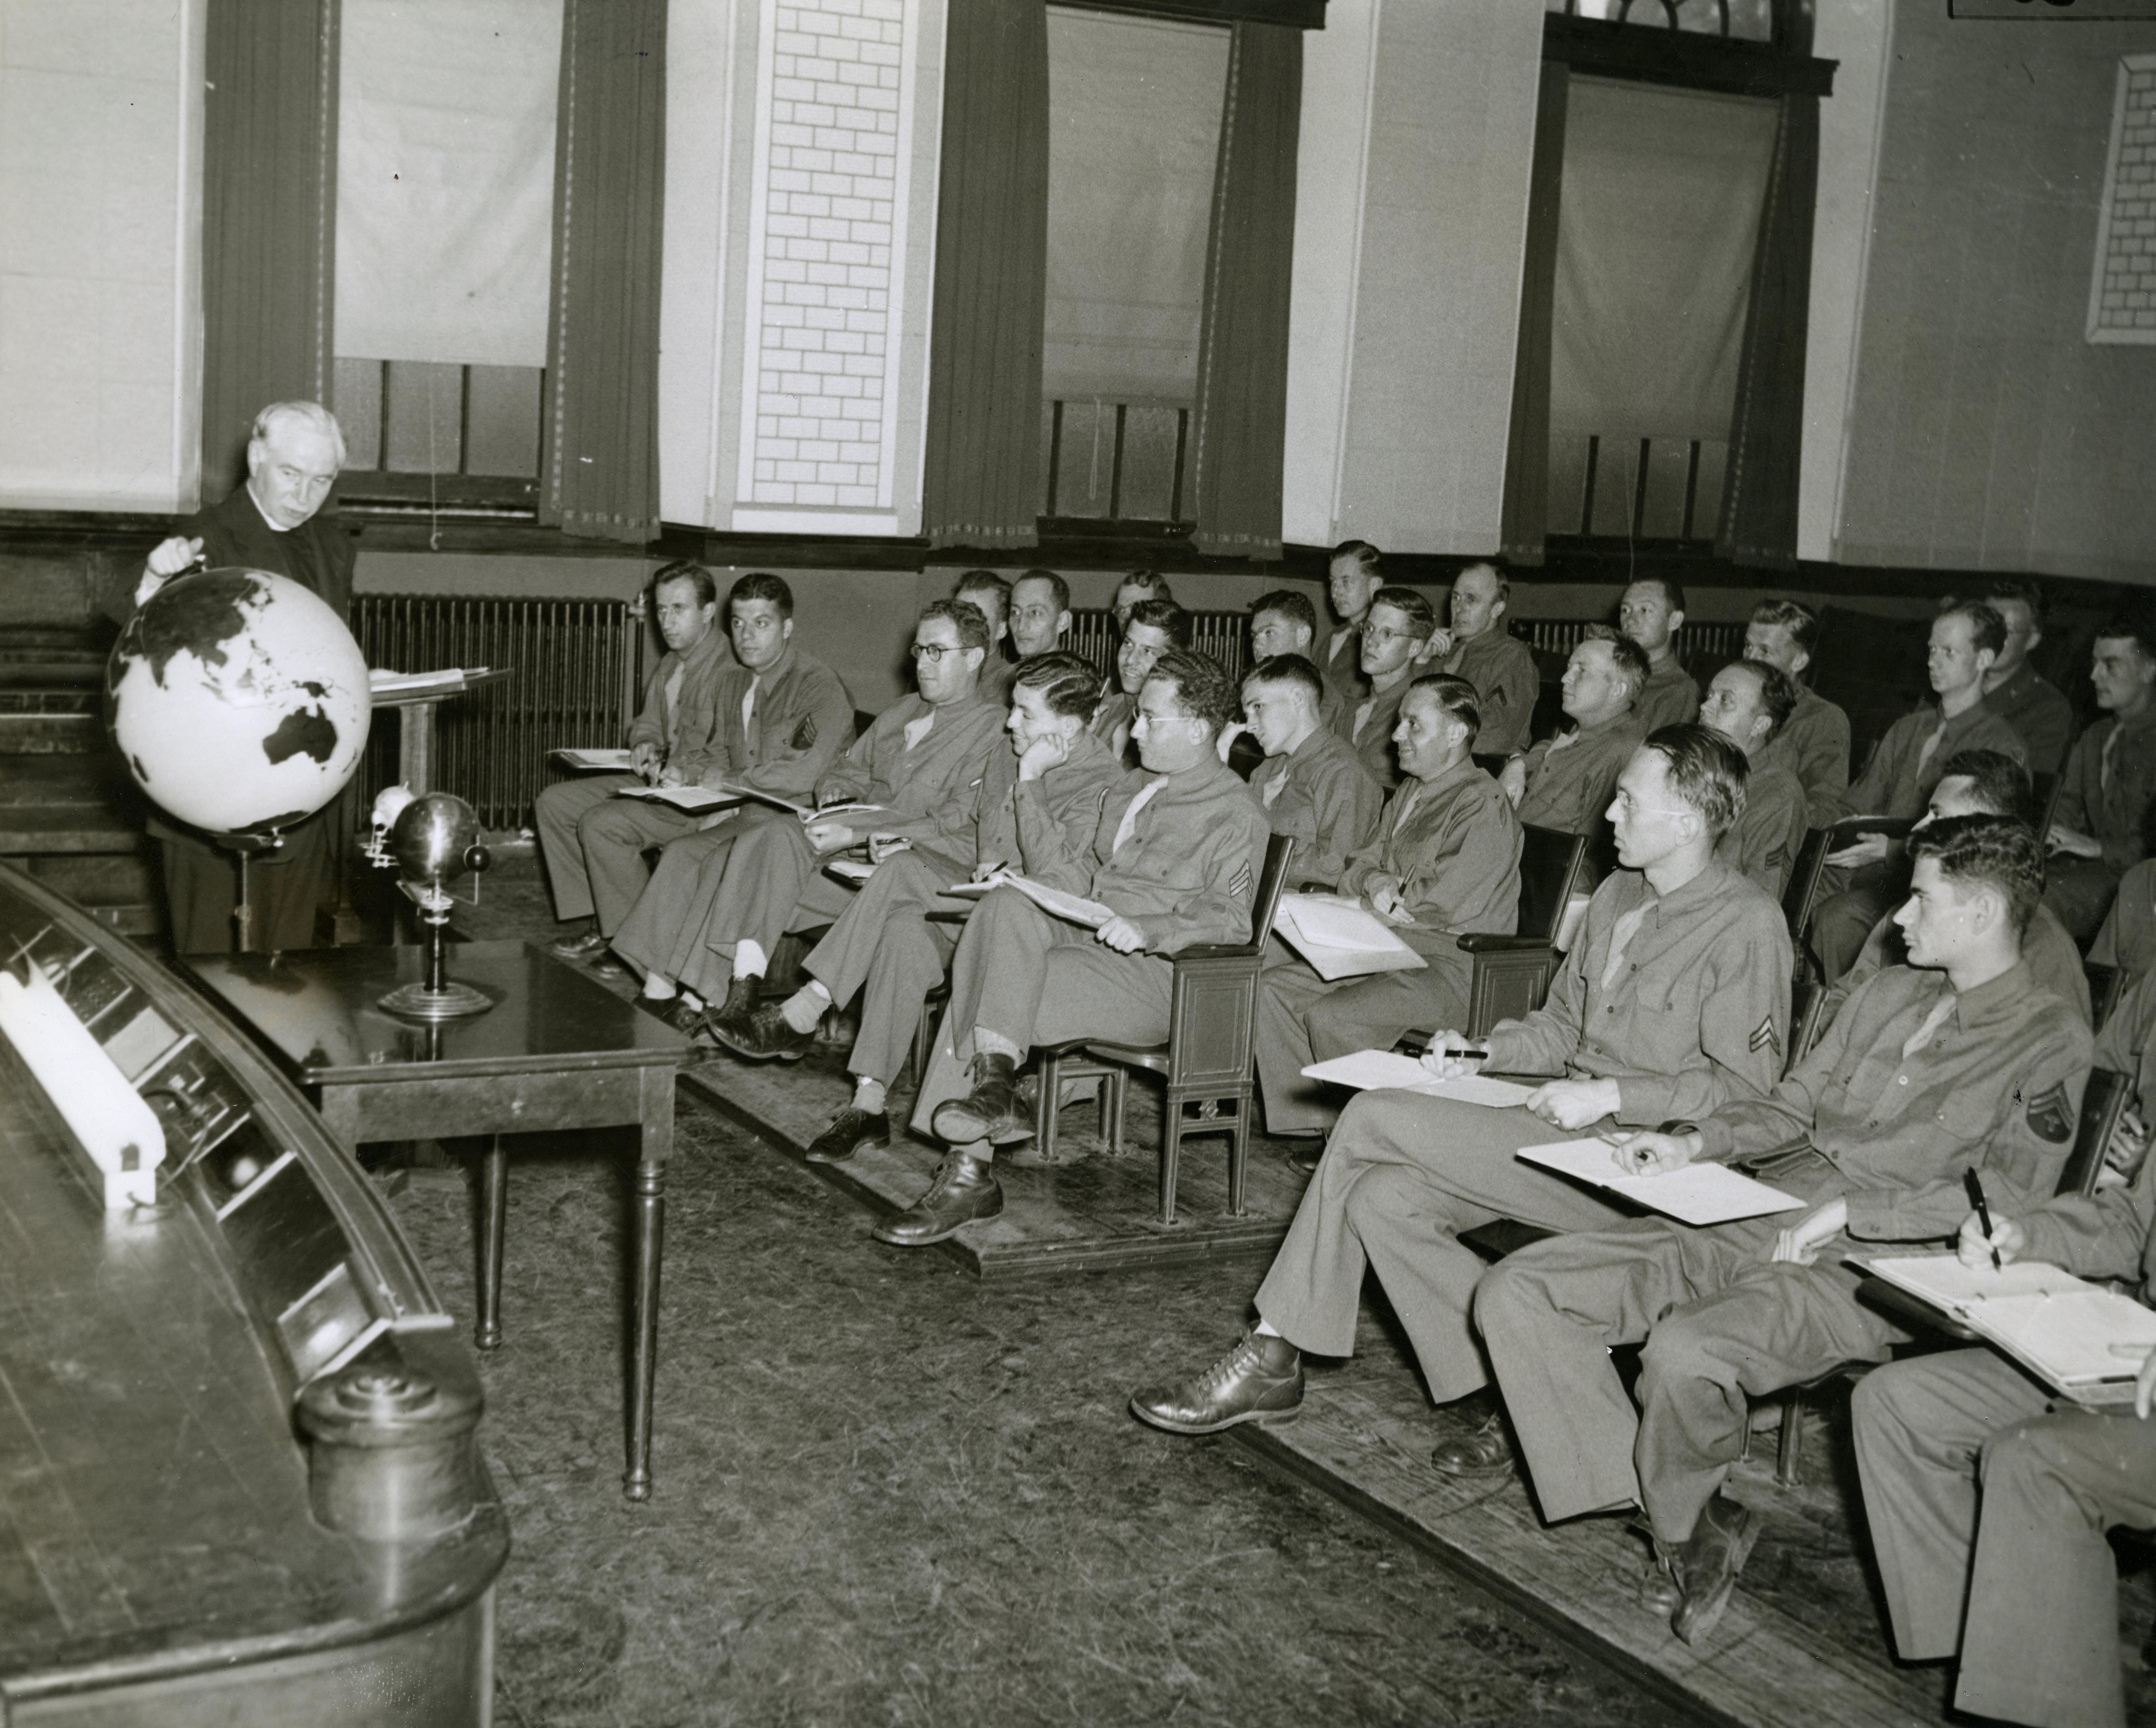 Fr. Edmund Walsh teaches ASTP cadets, 1944